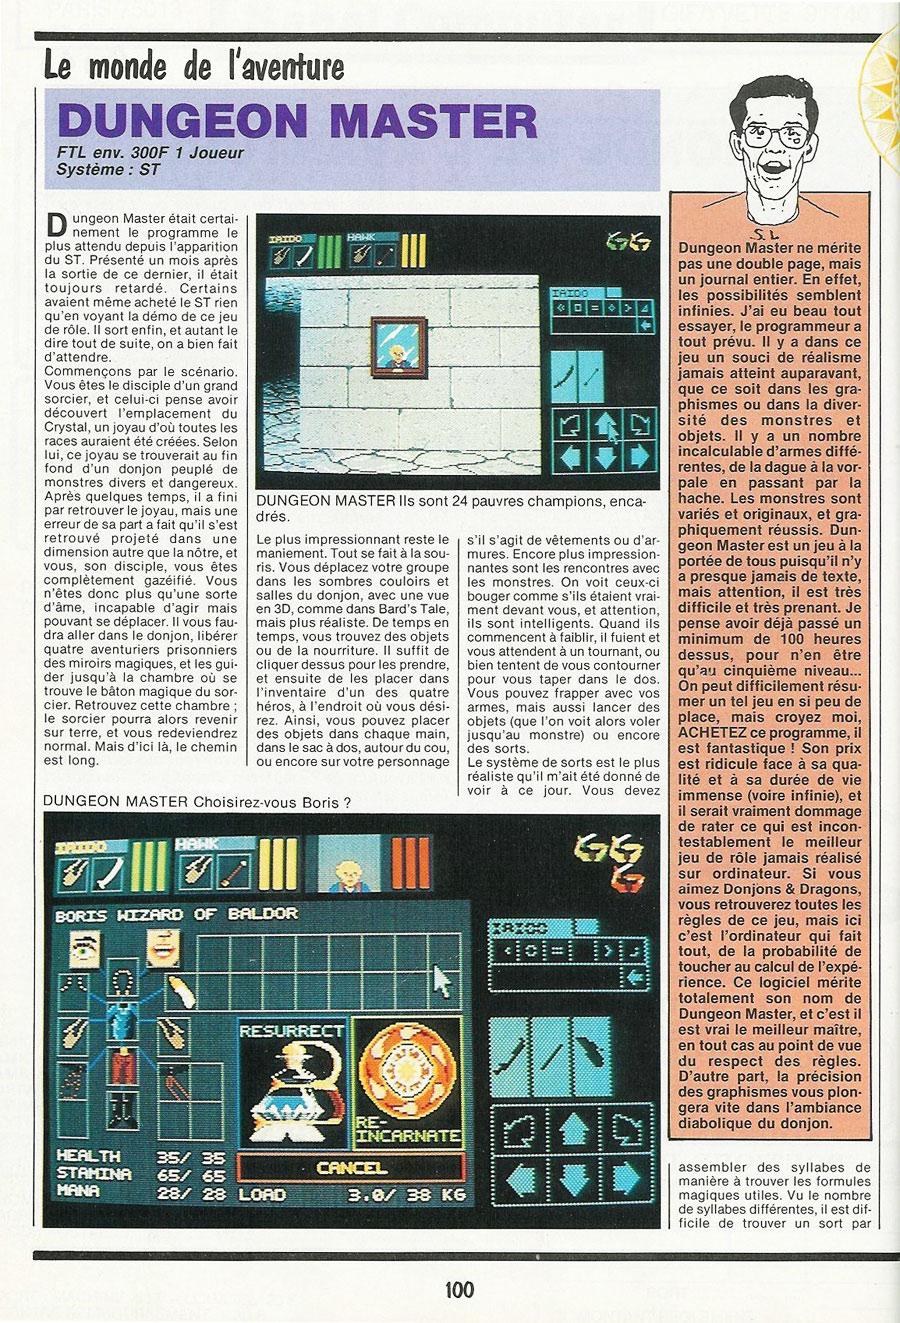 dungeon_master_atari_st_review_generation_4.jpg